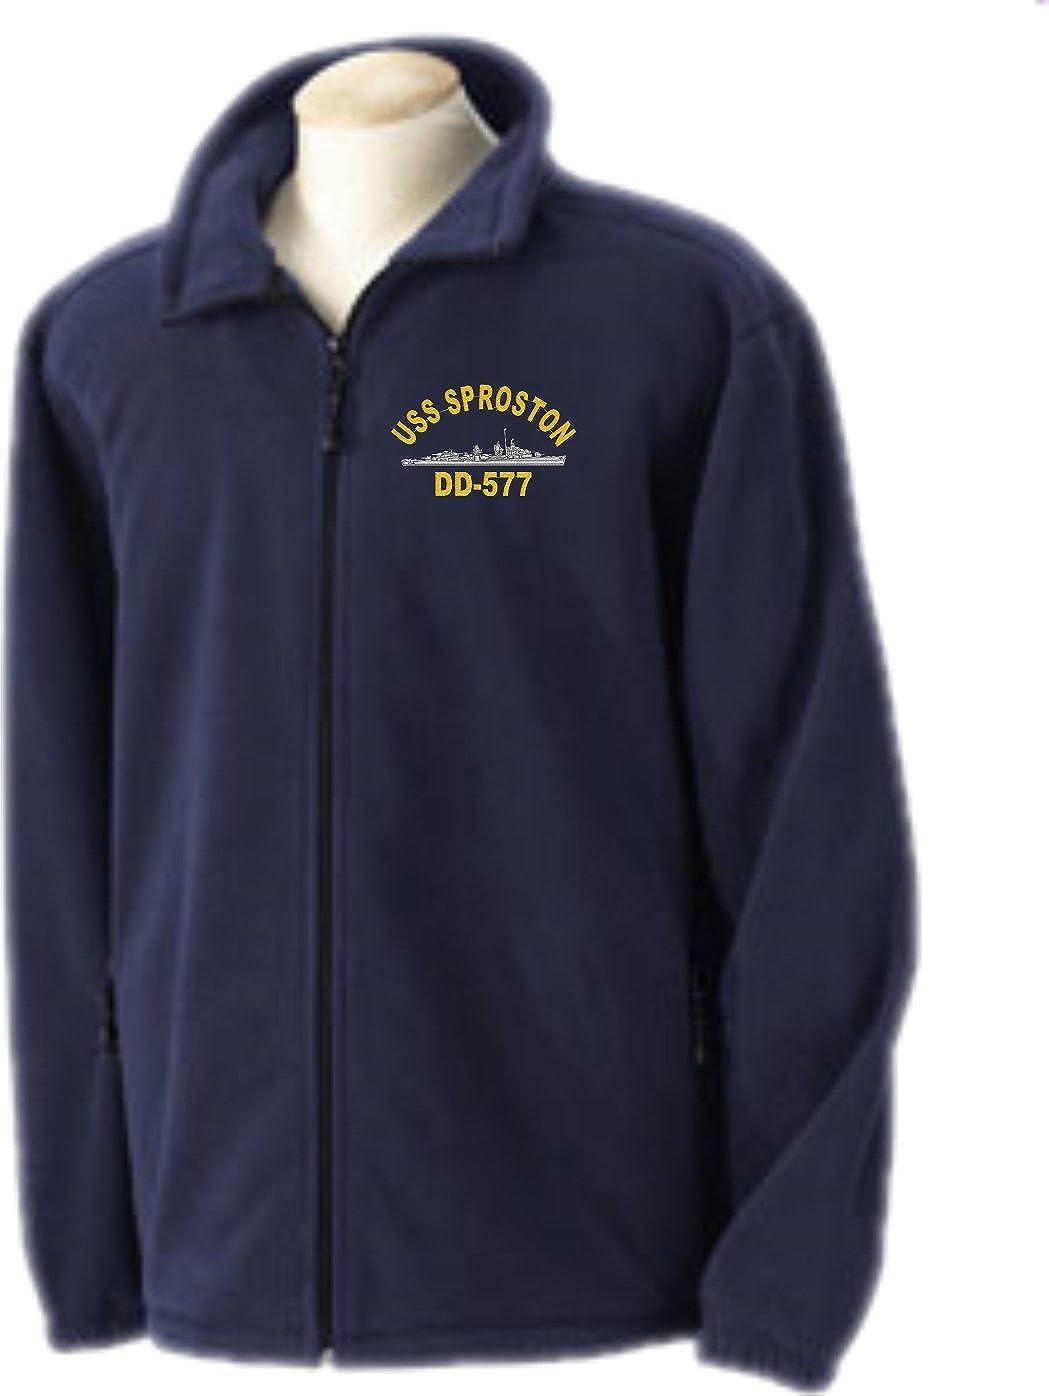 Custom Military Apparel USS Sproston DD-577 Embroidered Fleece Jacket Sizes SMALL-4X